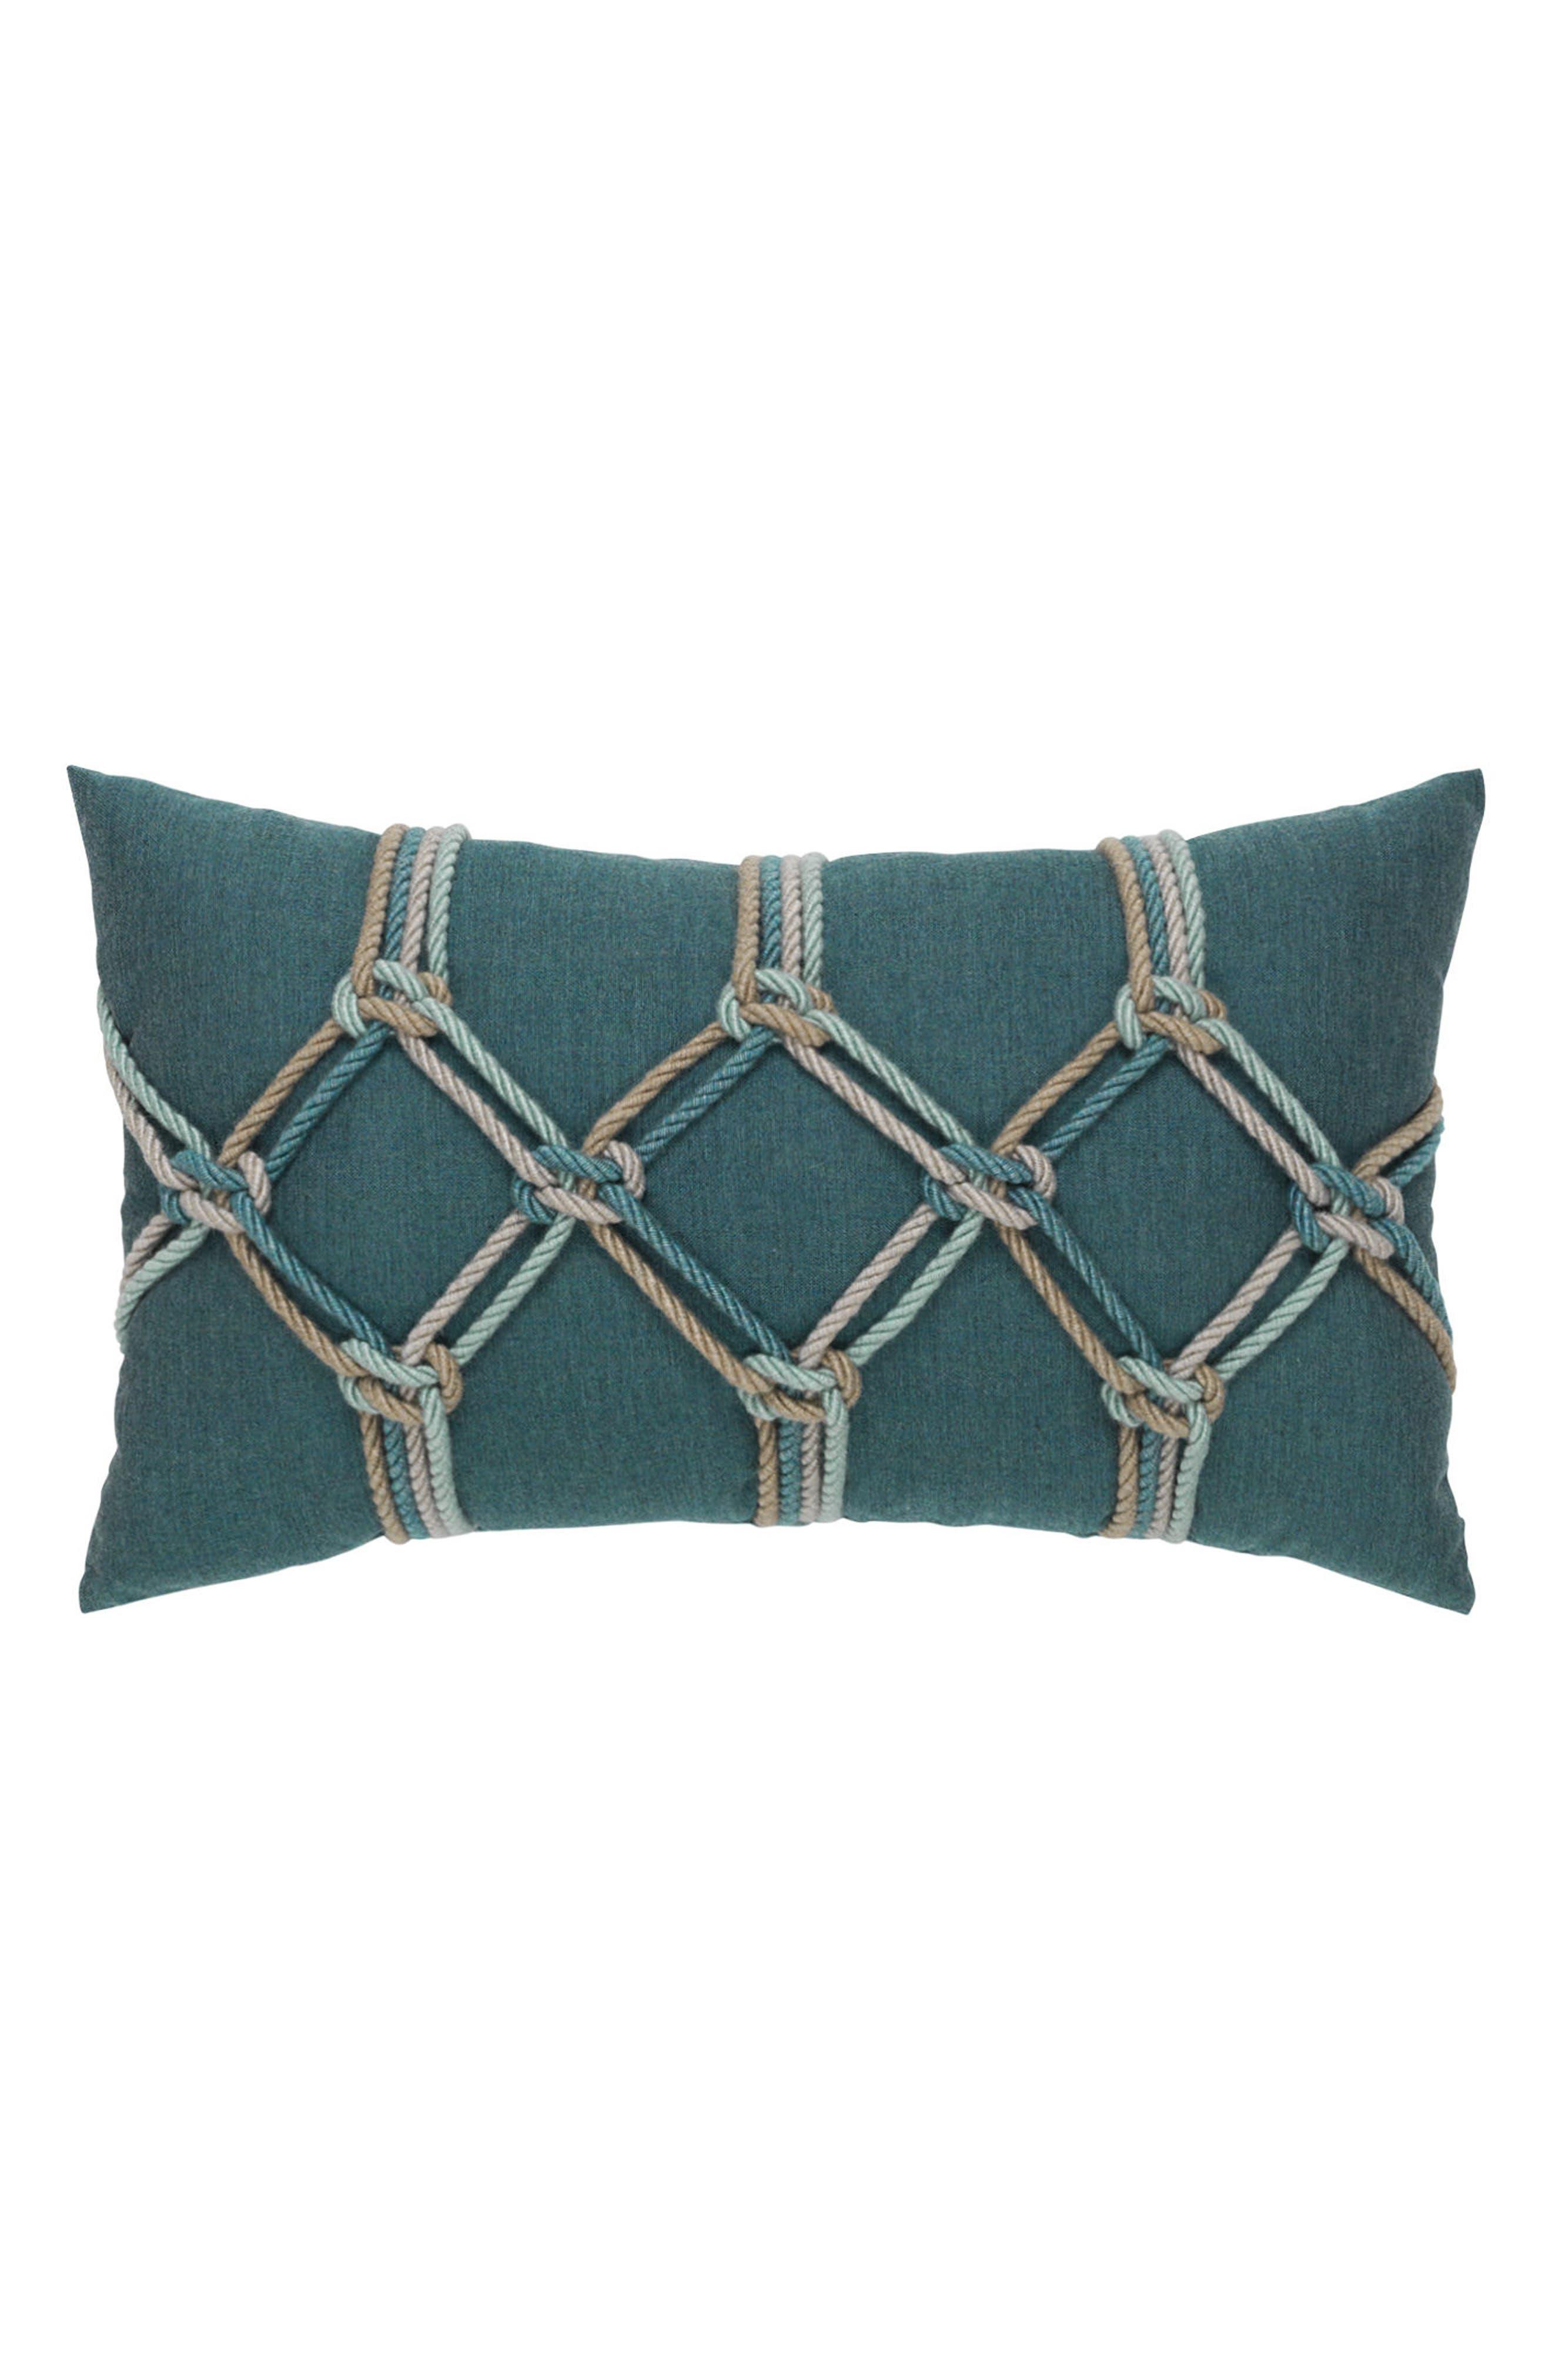 Lagoon Rope Lumbar Pillow,                             Main thumbnail 1, color,                             BLUE